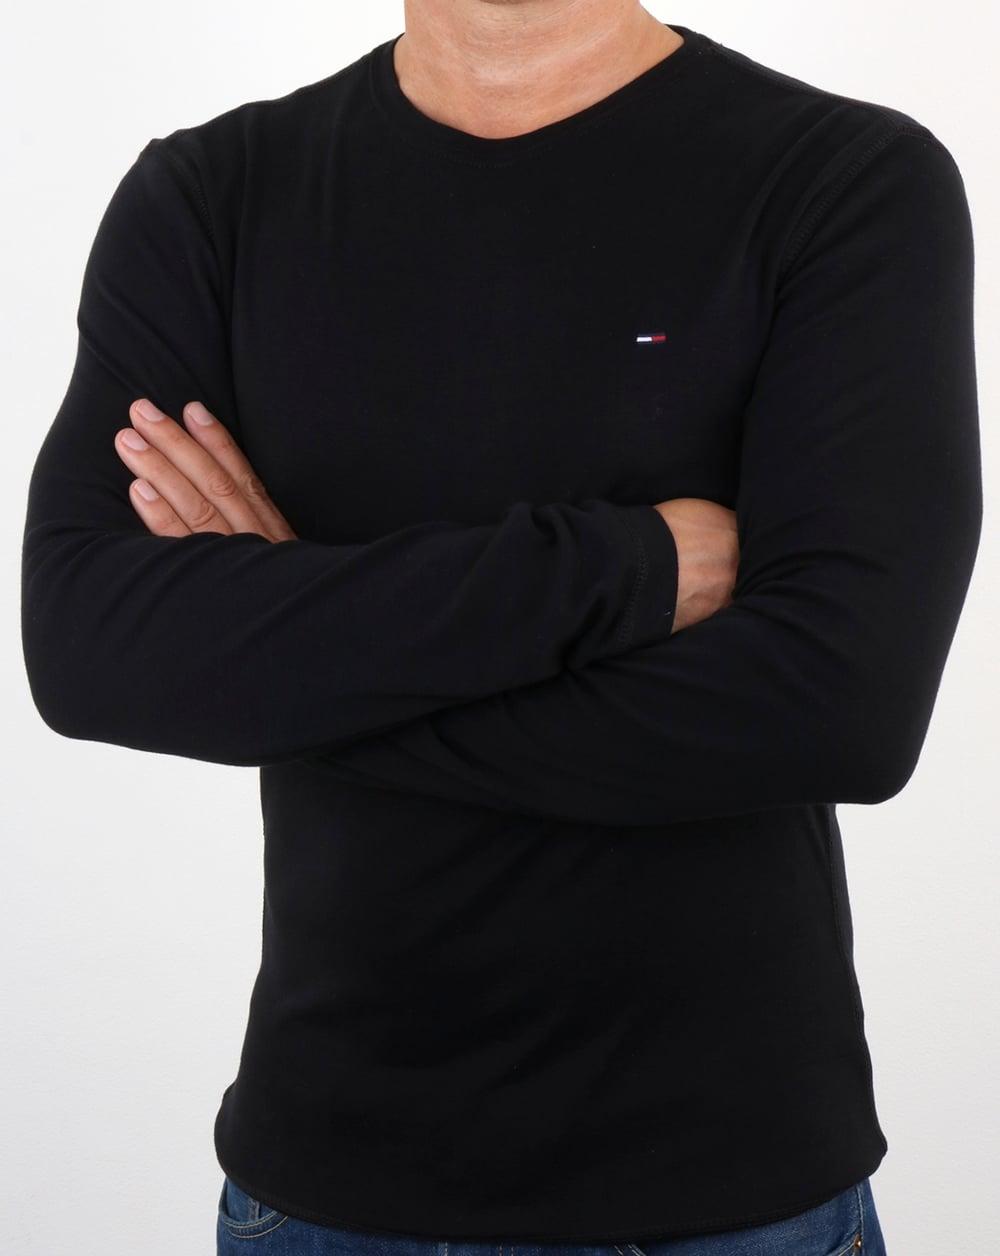 b199fd2d Tommy Hilfiger Jeans Tommy Hilfiger Rib Cotton Long Sleeve T Shirt Black